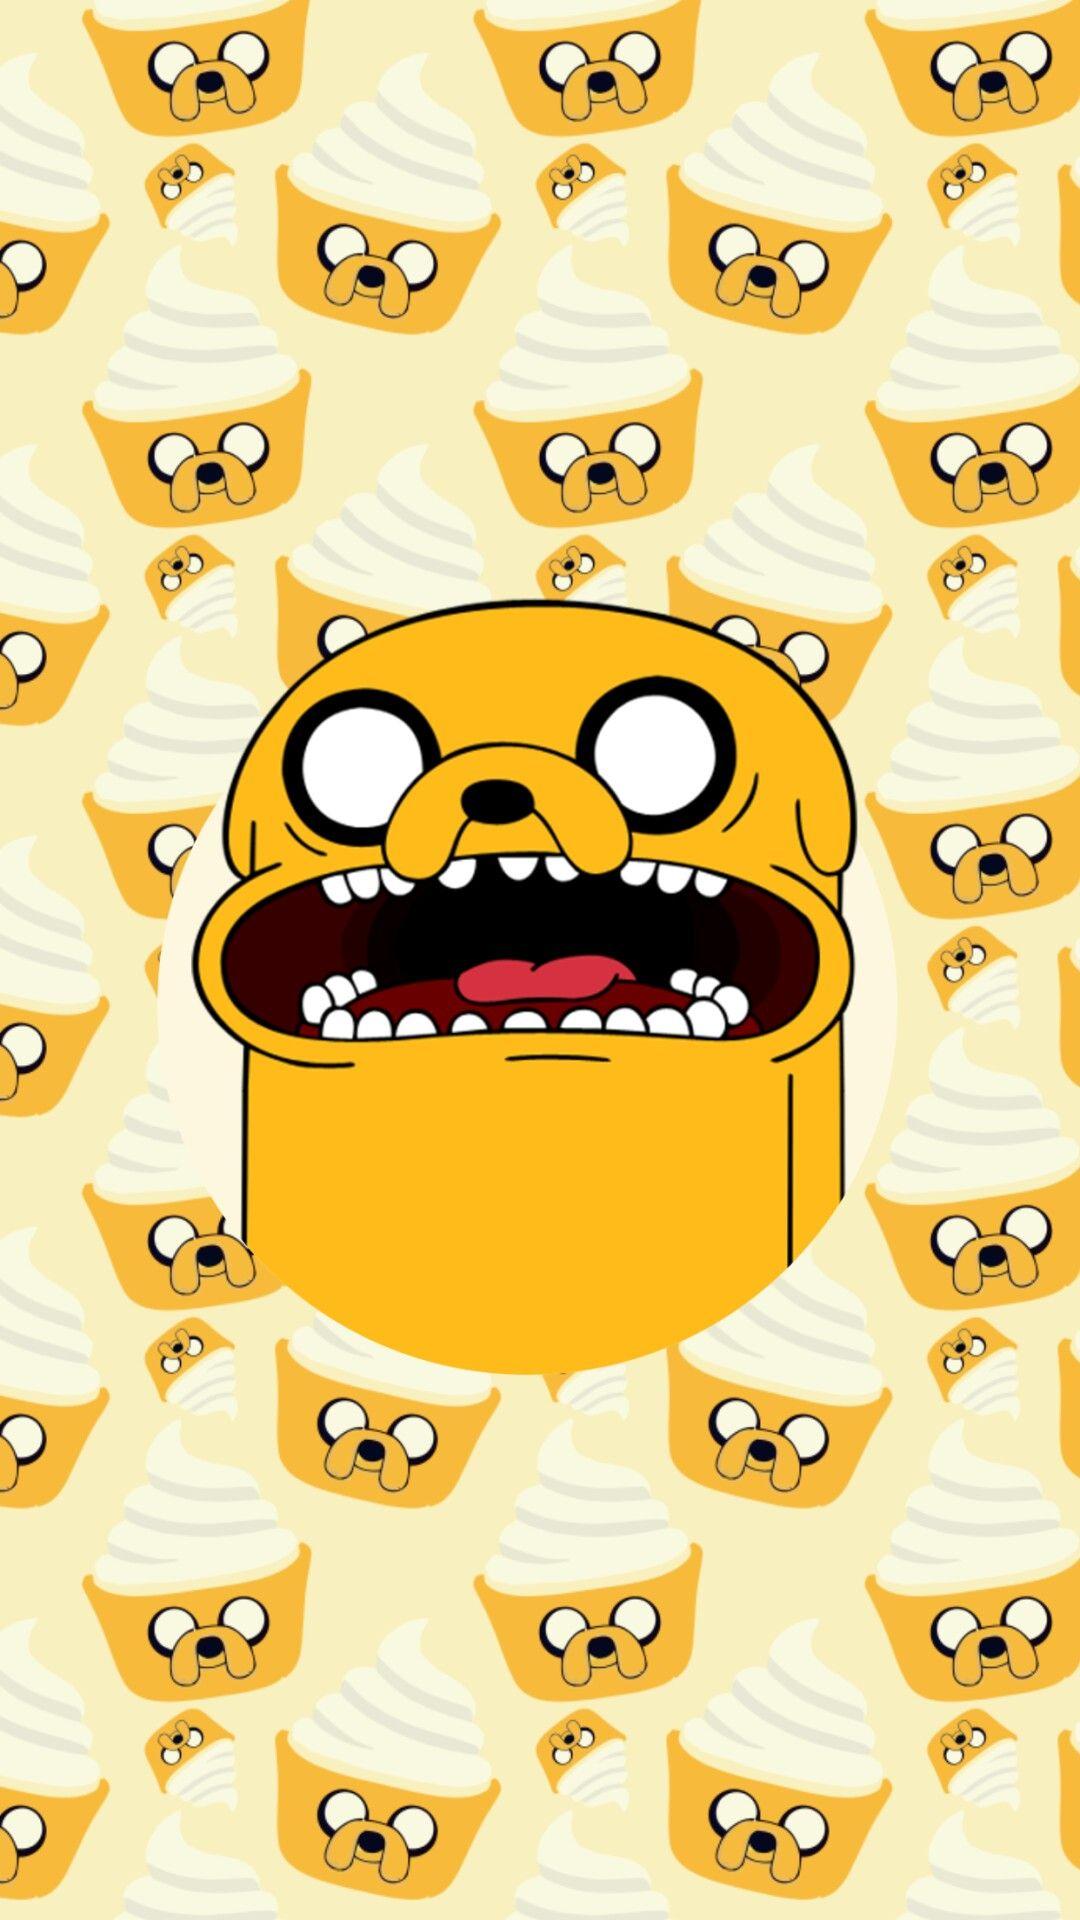 Gravity Falls Bill Iphone Wallpaper Adventure Time Wallpapers Iphone 6 Plus Adventure Time